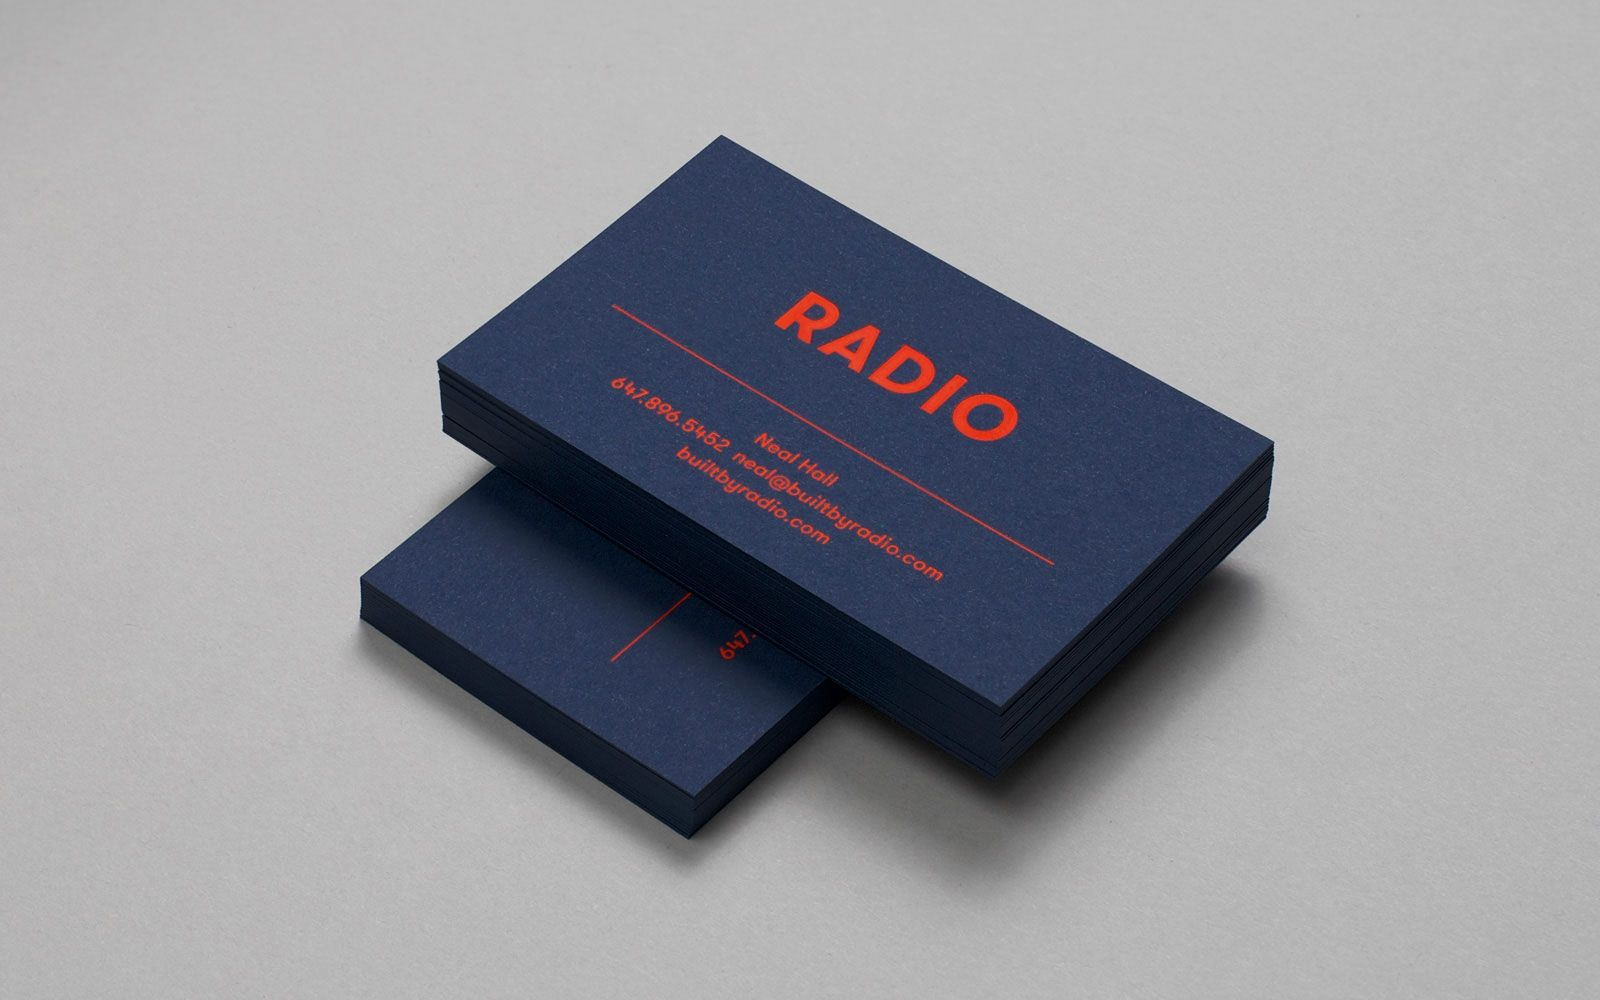 Radio grilli type independent swiss type foundry gt walsheim radio grilli type independent swiss type foundry gt walsheim free trial fonts business card colourmoves